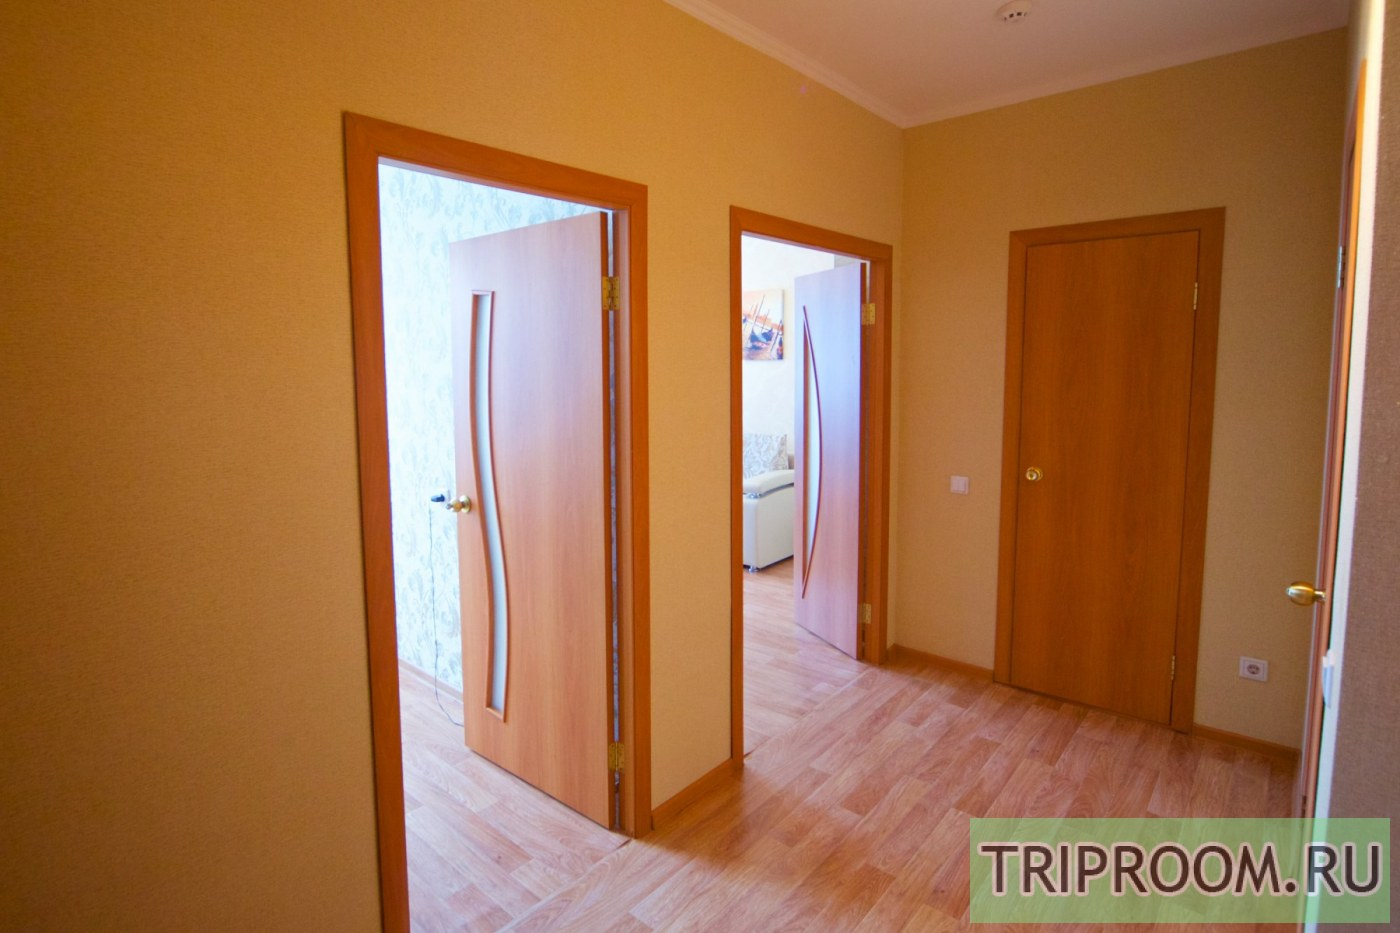 1-комнатная квартира посуточно (вариант № 40369), ул. Алексеева улица, фото № 8